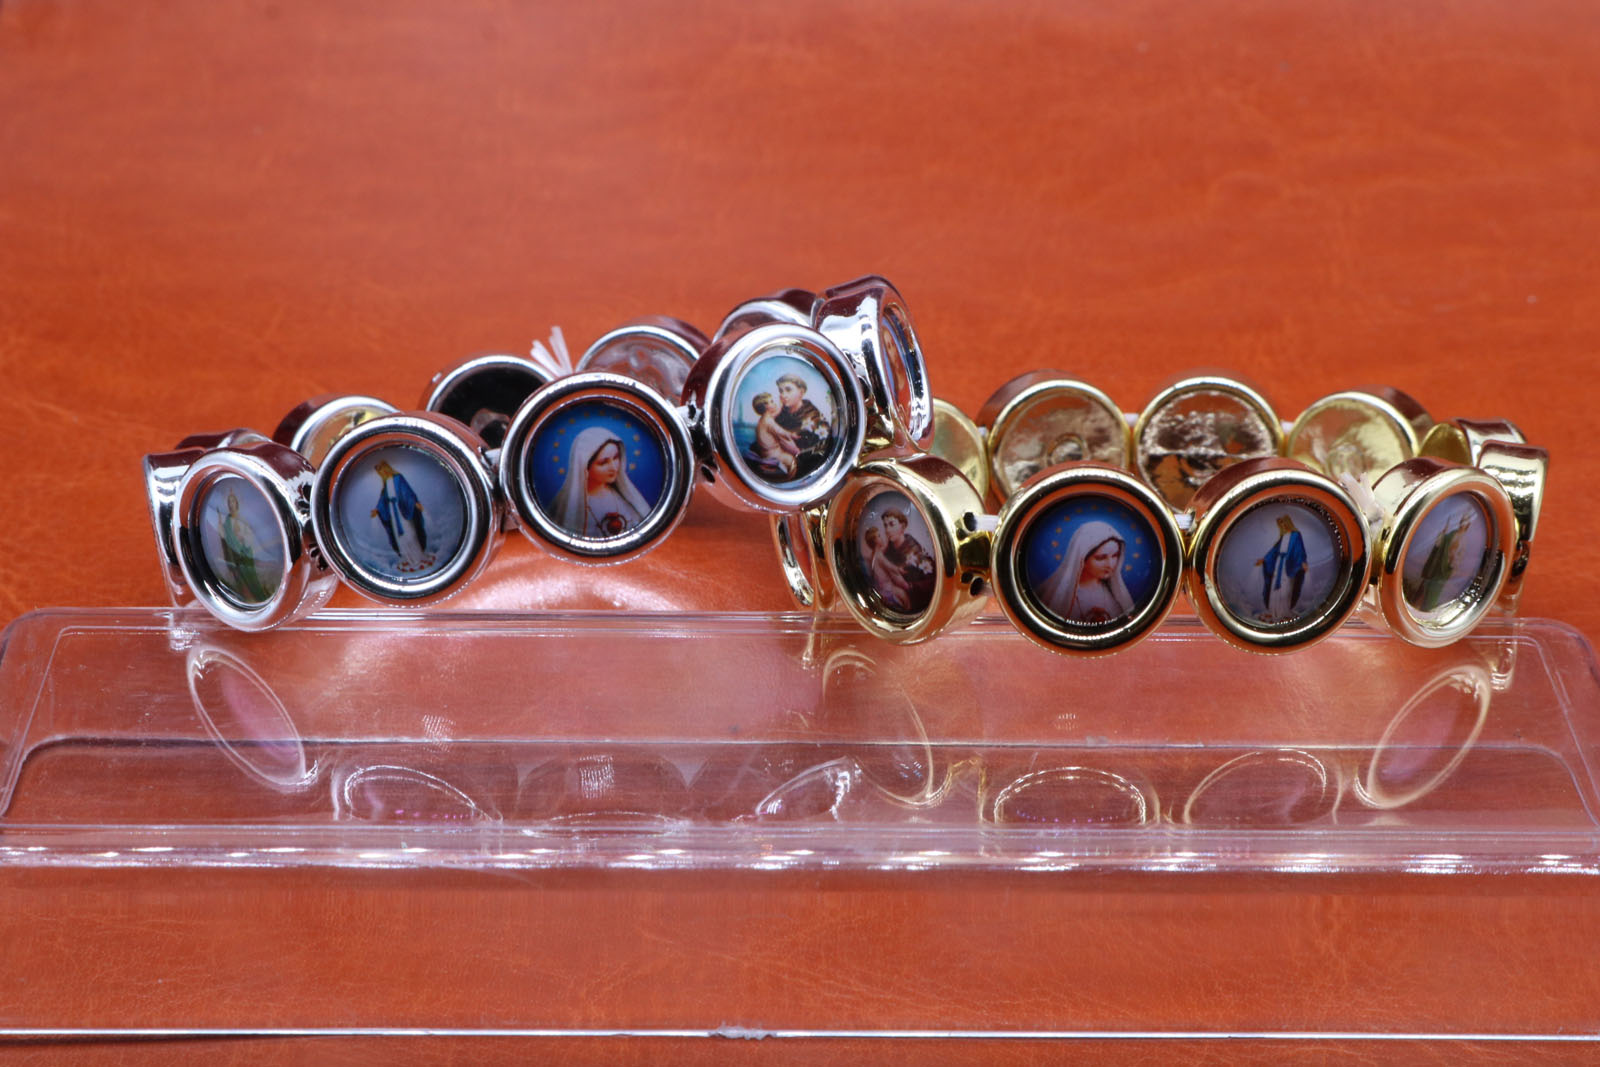 Catholic Round Plastic High Quality Jesus Christ Beaded Bracelet Rose Bracelet Men's and Women's Fashion Bracelets